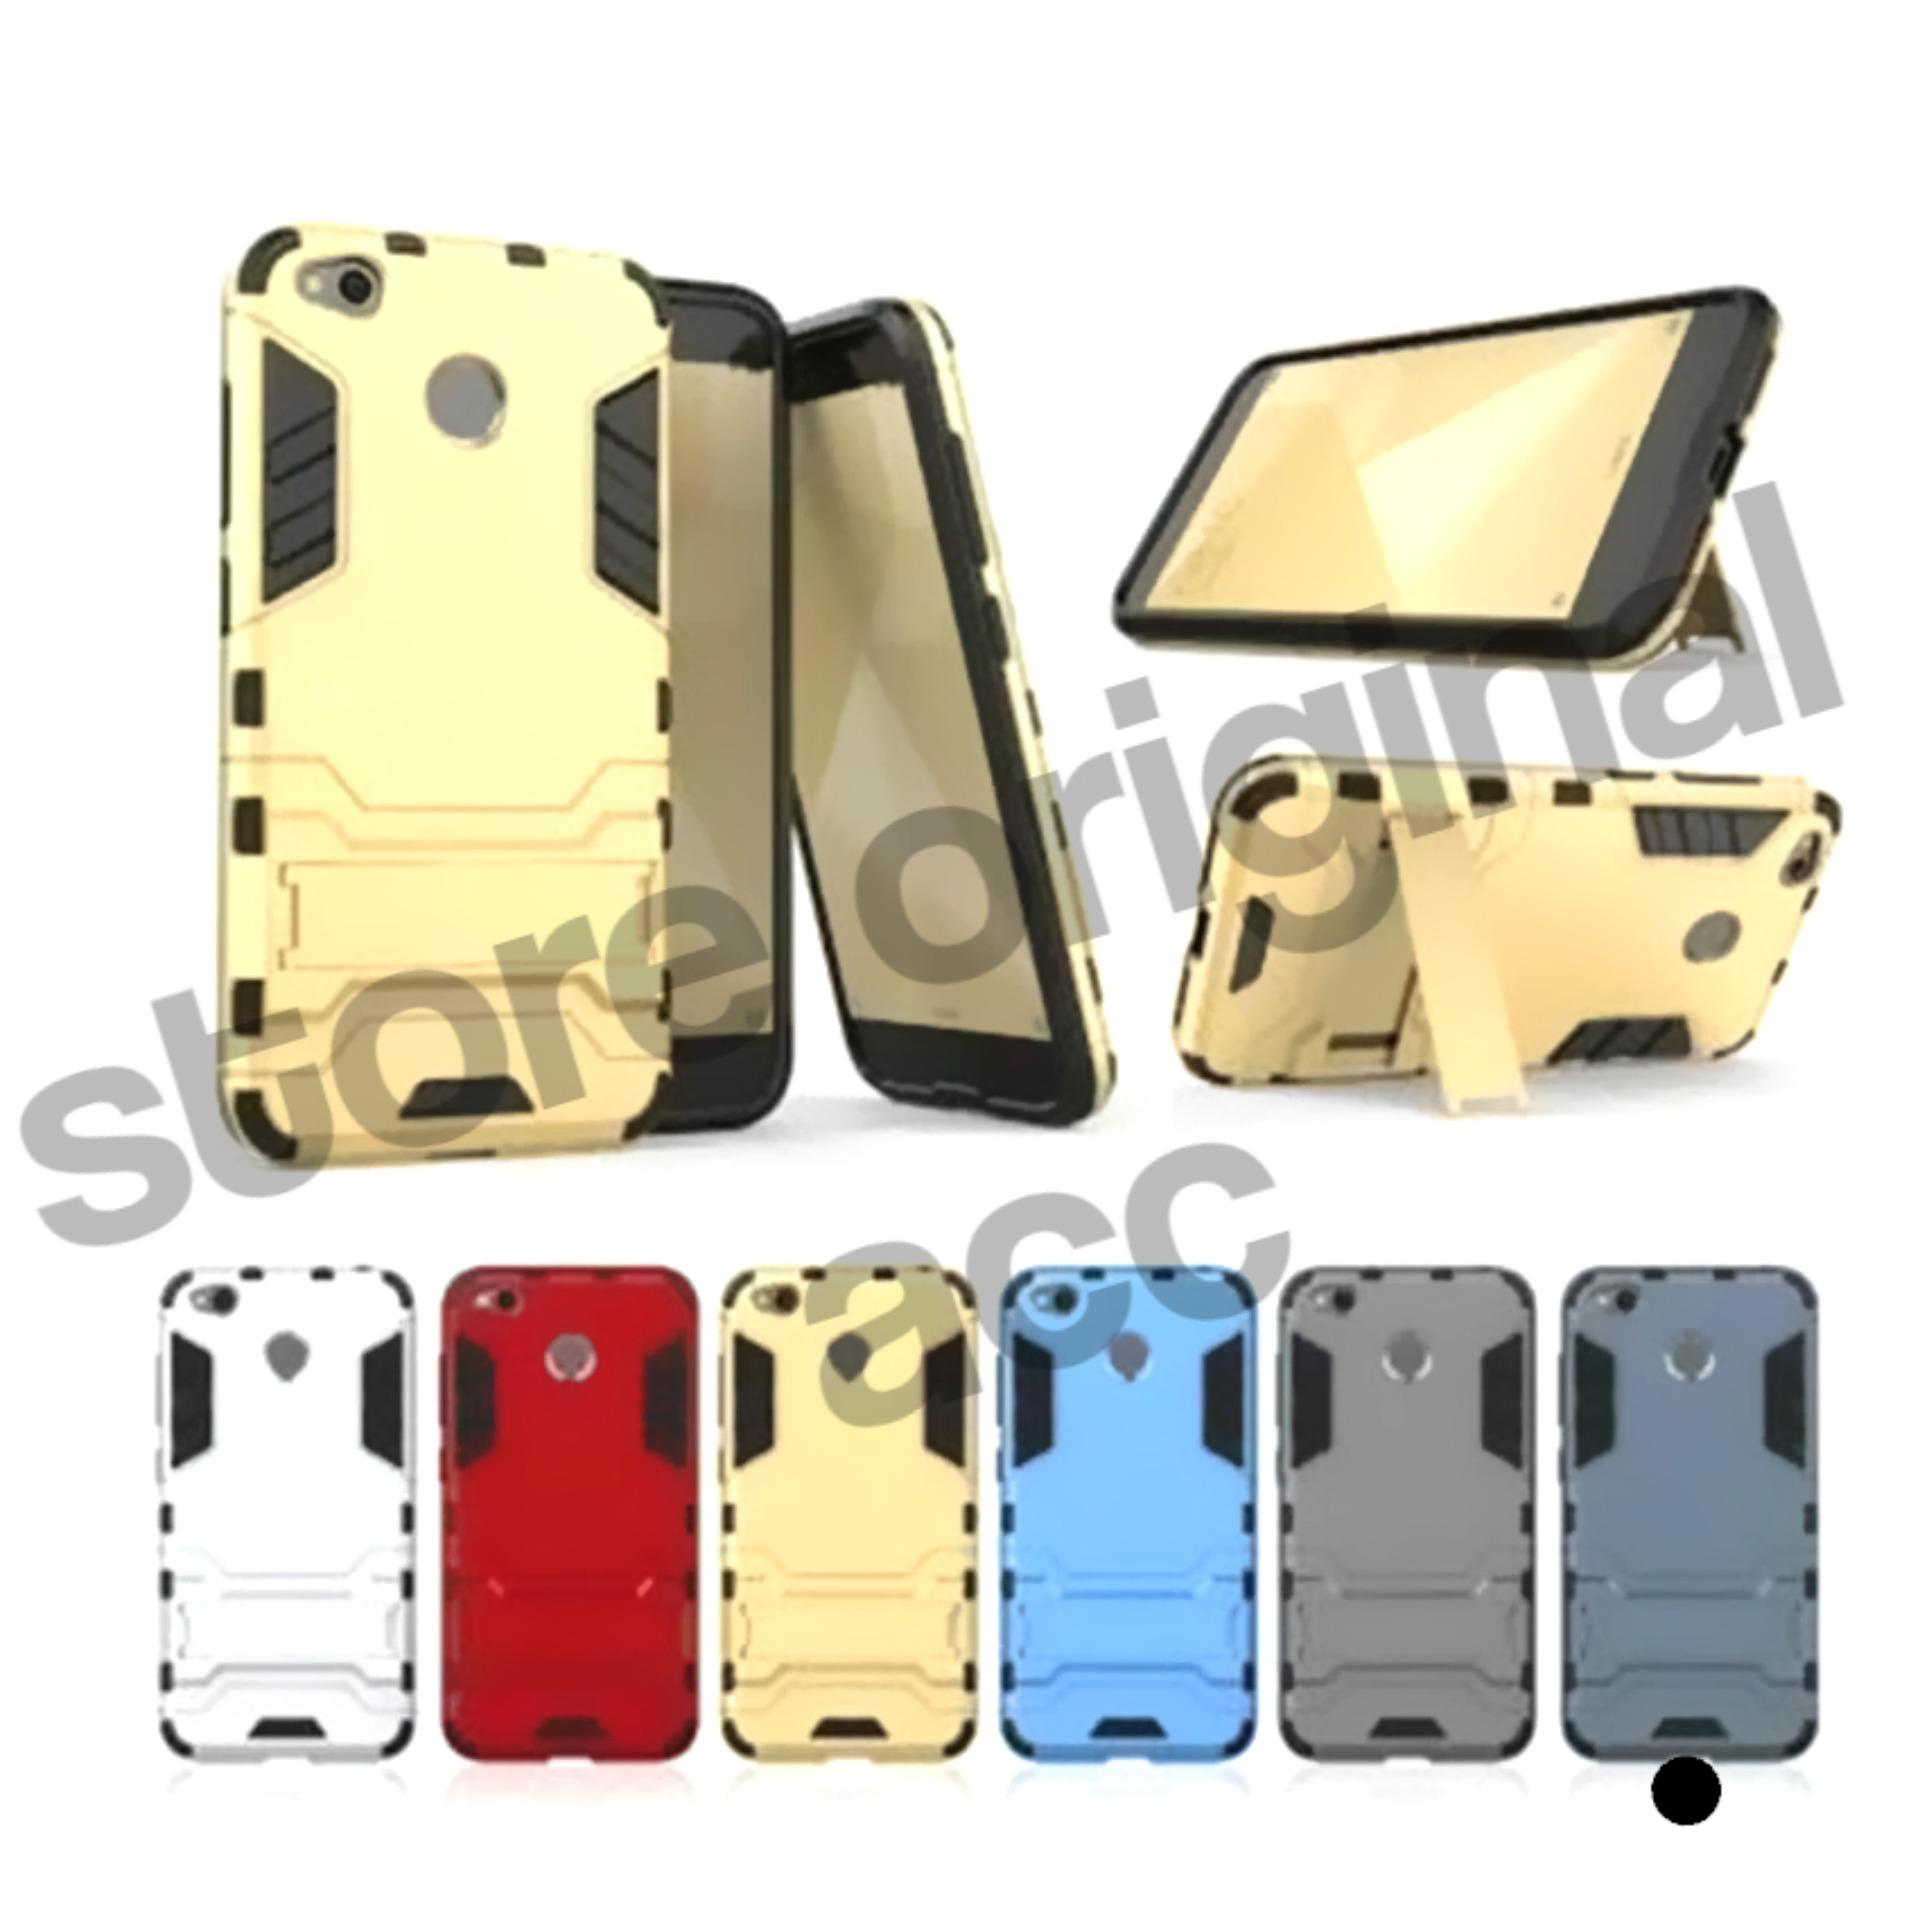 Casing Handphone Iron Robot Standing Hardcase Casing For Xiomi Redmi 3 PRO / 3S / 3X / 3 Biasa